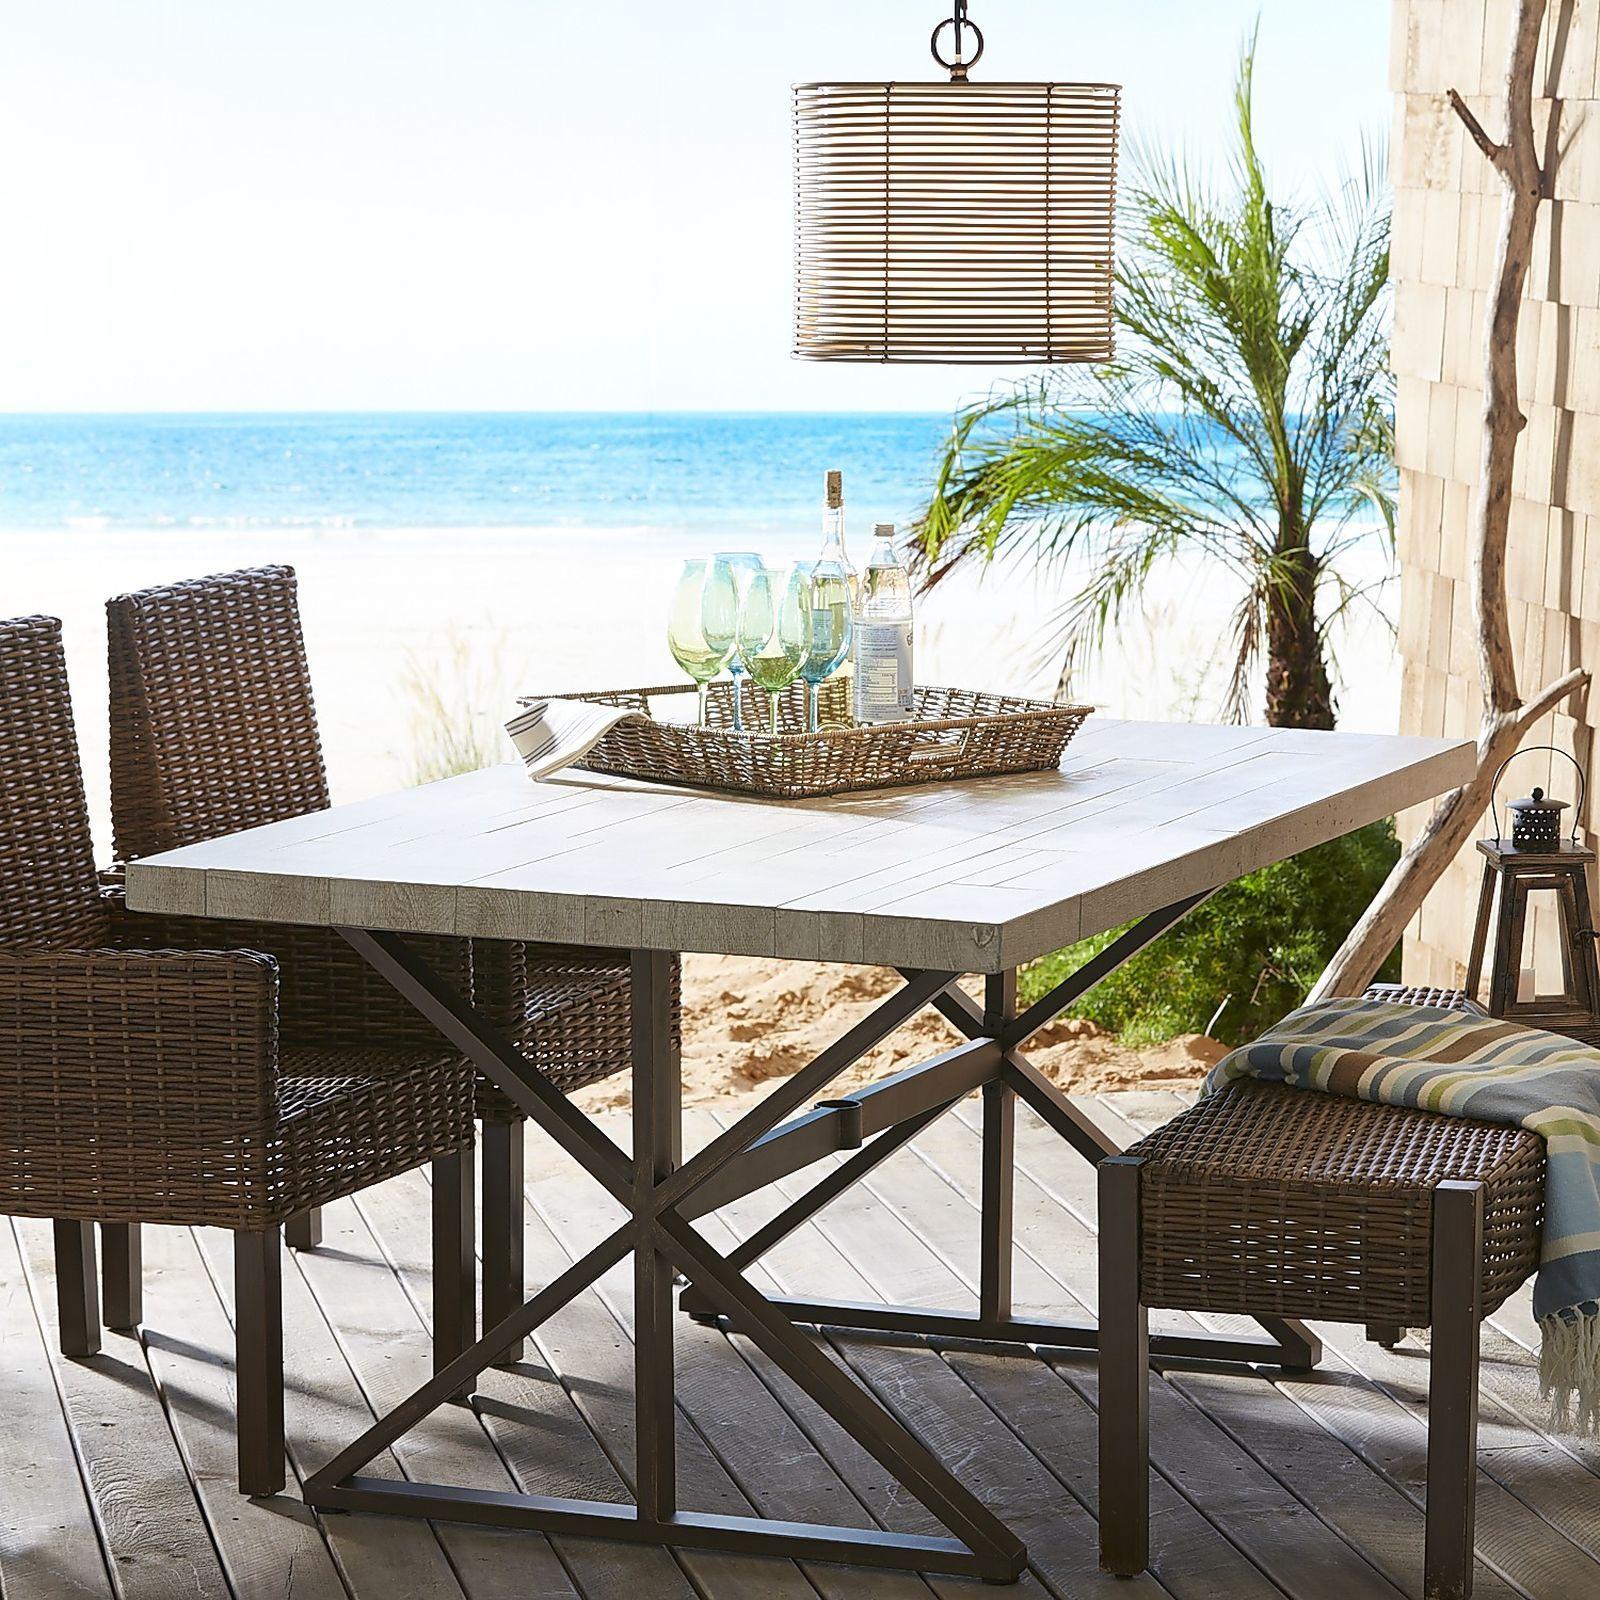 Paxson Wood Grain Tile Dining Table